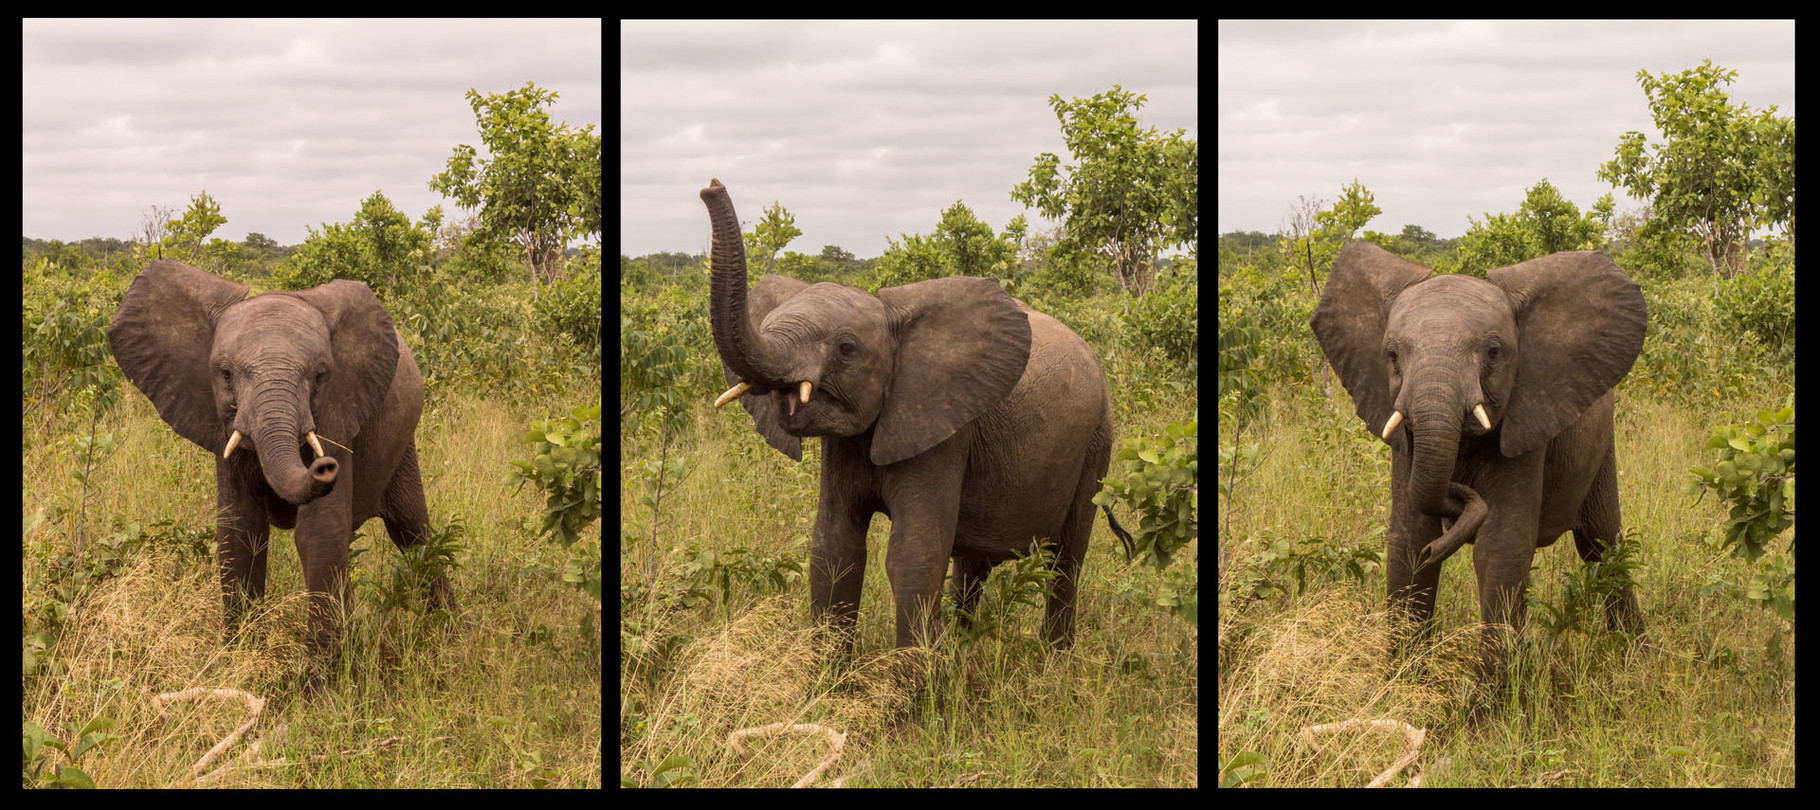 Elefant [Chobe Park, Botswana, 2015]